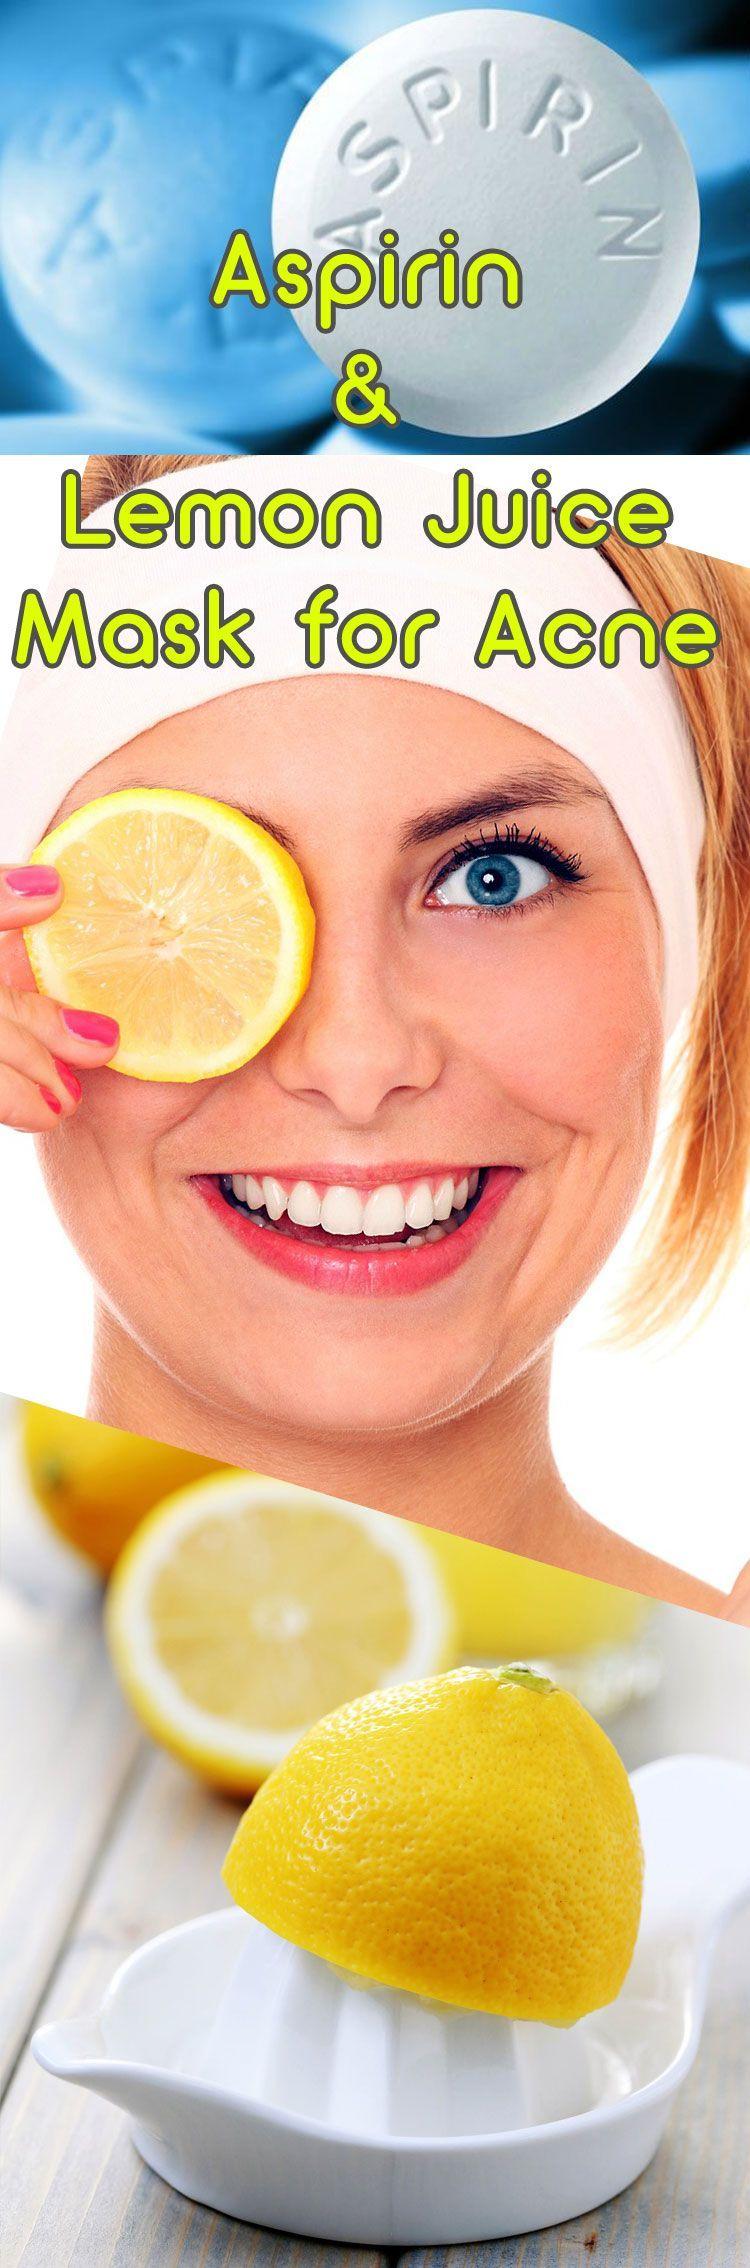 Aspirin lemon juice mask for acne juice mask best